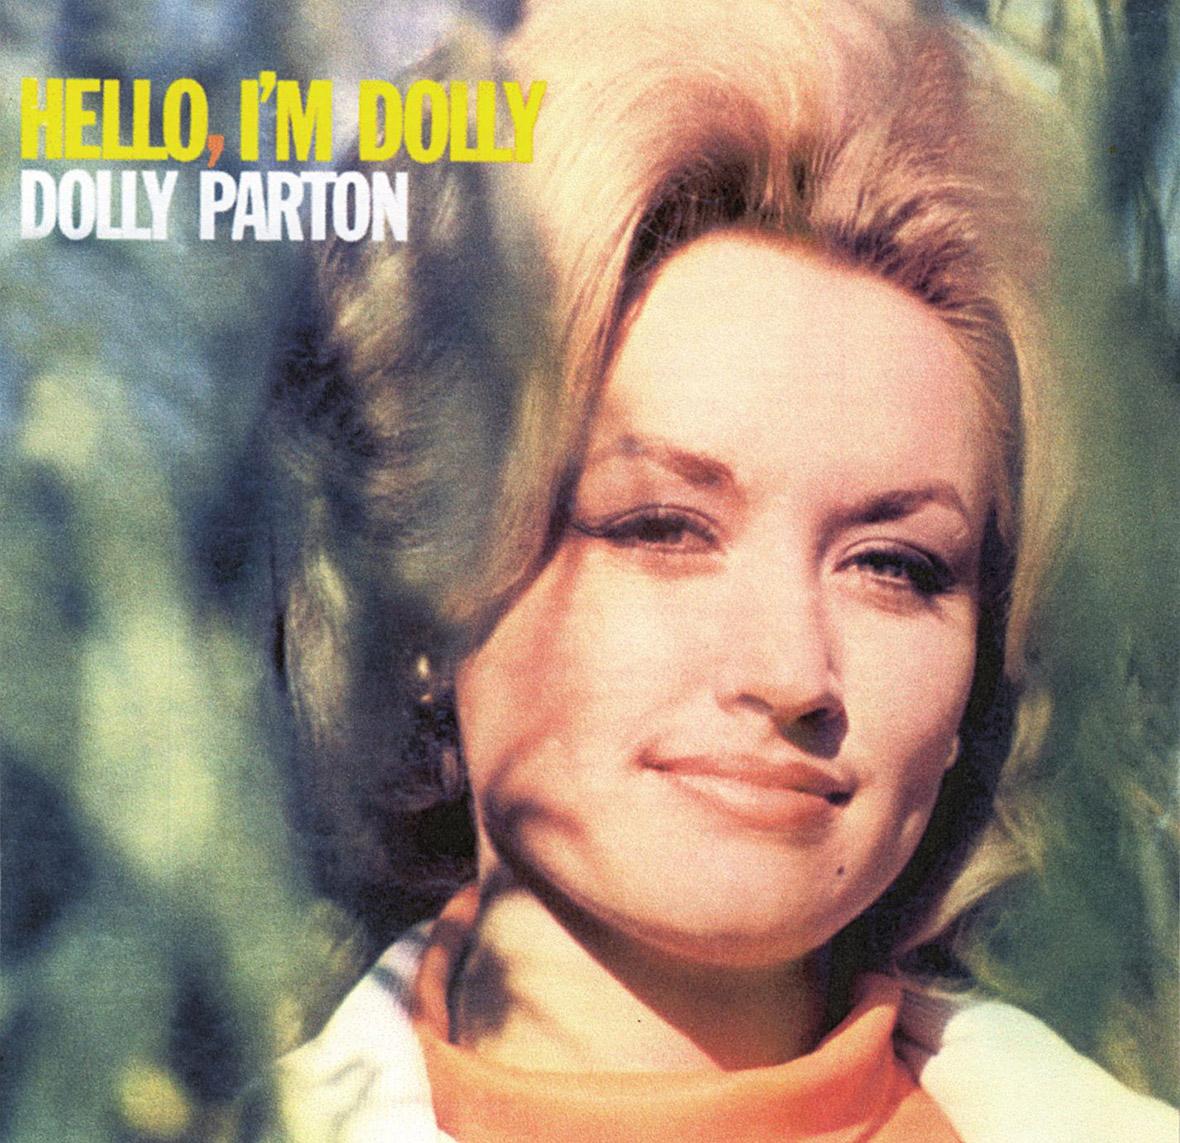 dolly-parton-turns-70.jpg